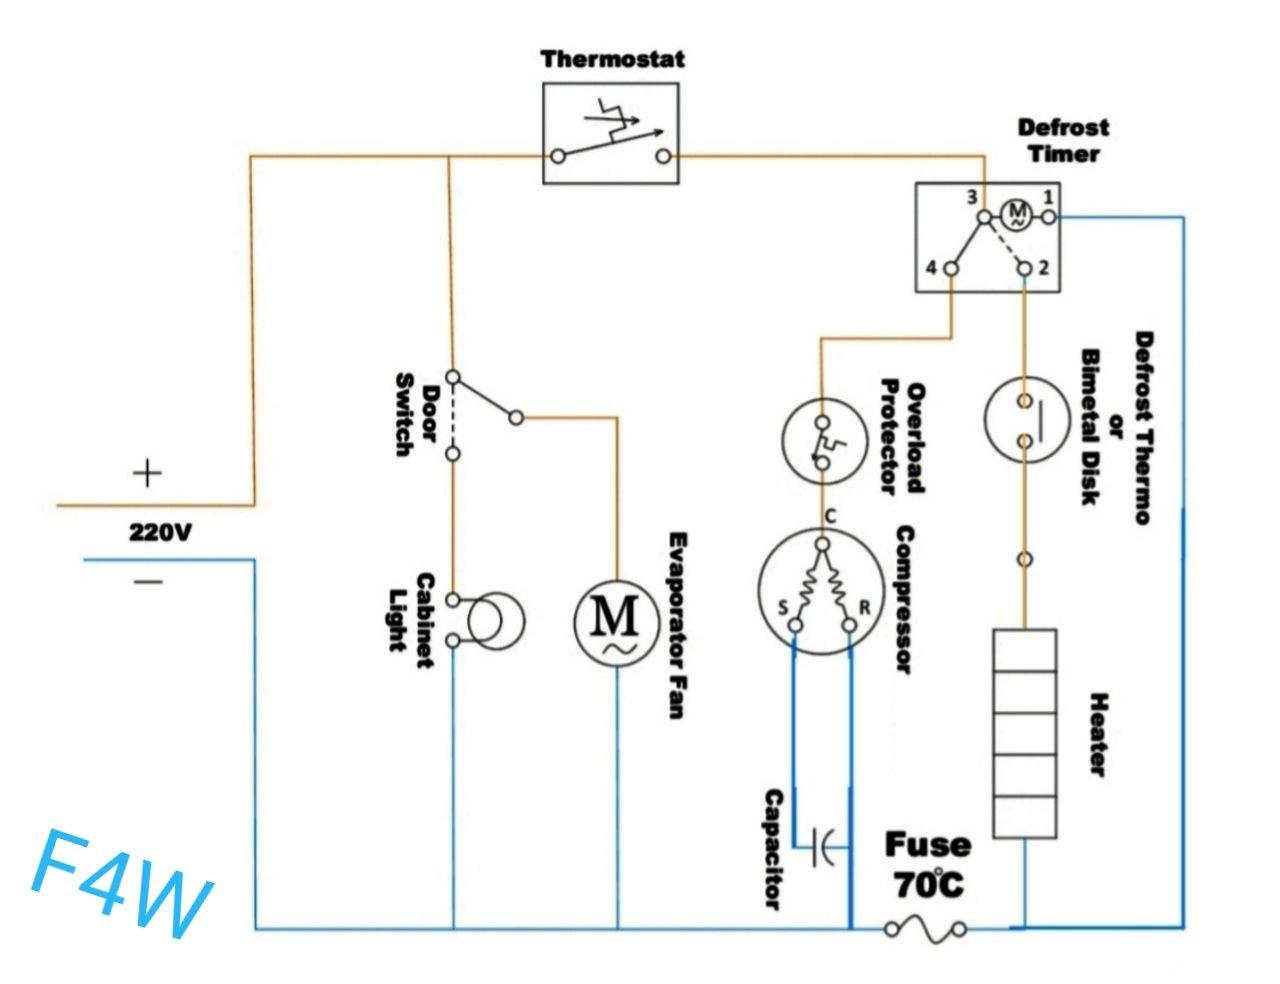 Bfreezer Defrost Timer Wiring Diagrams